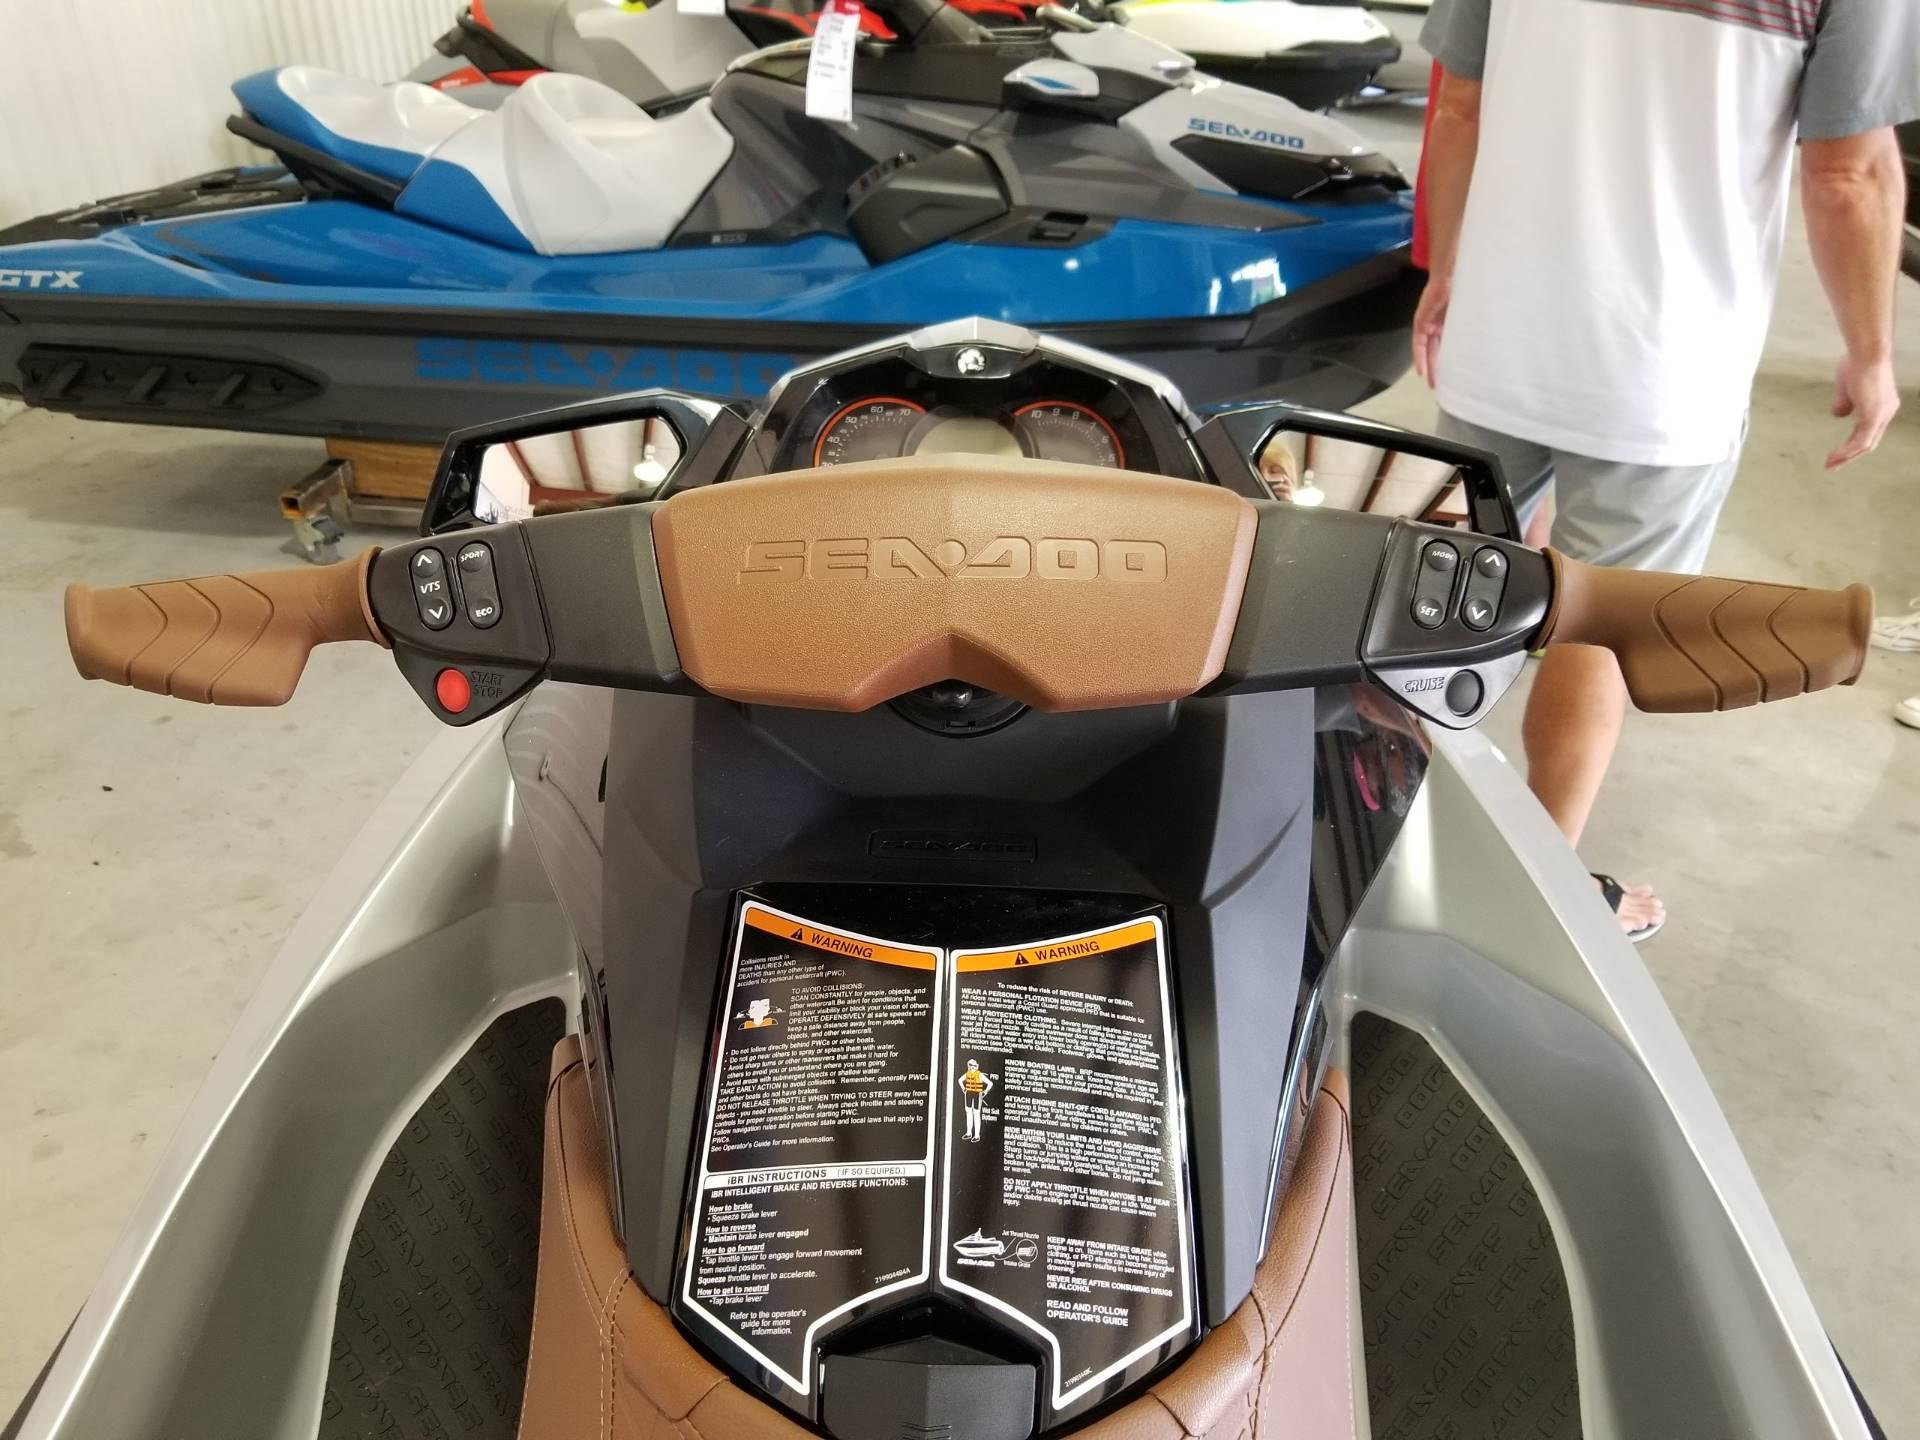 2018 Sea-Doo GTI Limited 155 10